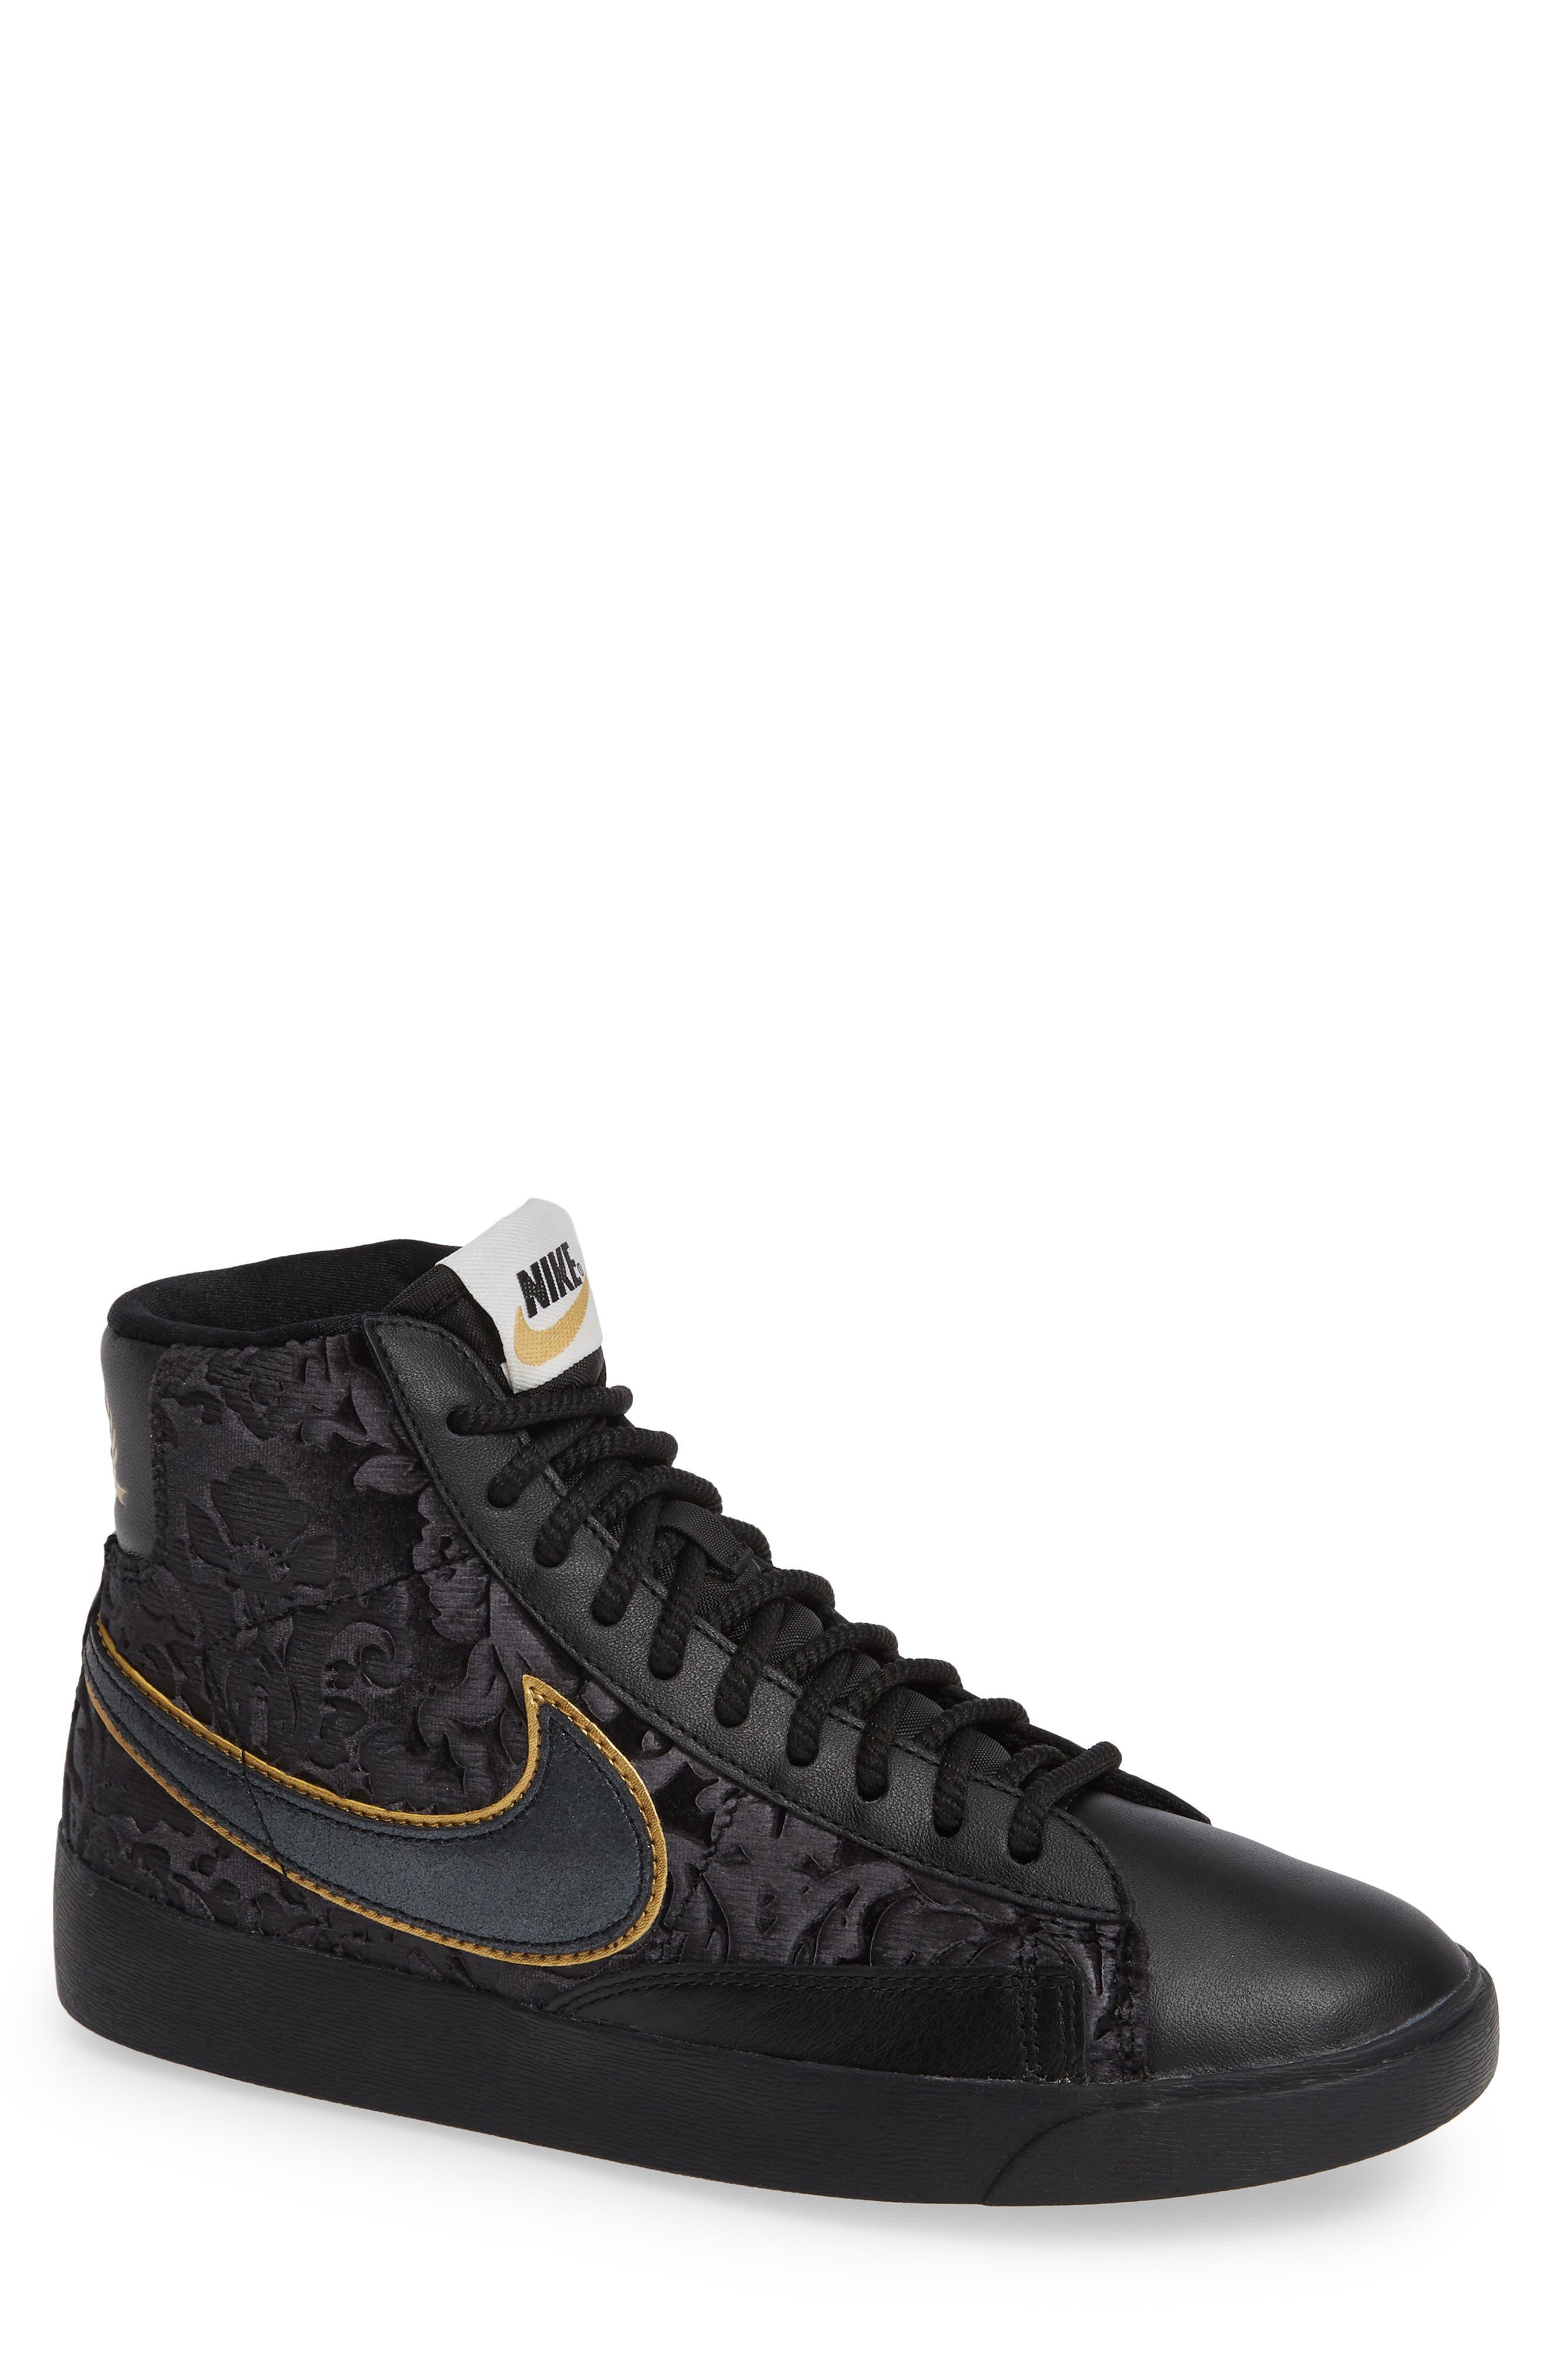 NIKE Blazer Mid Top Sneaker, Main, color, BLACK/ GOLD/ SUMMIT WHITE